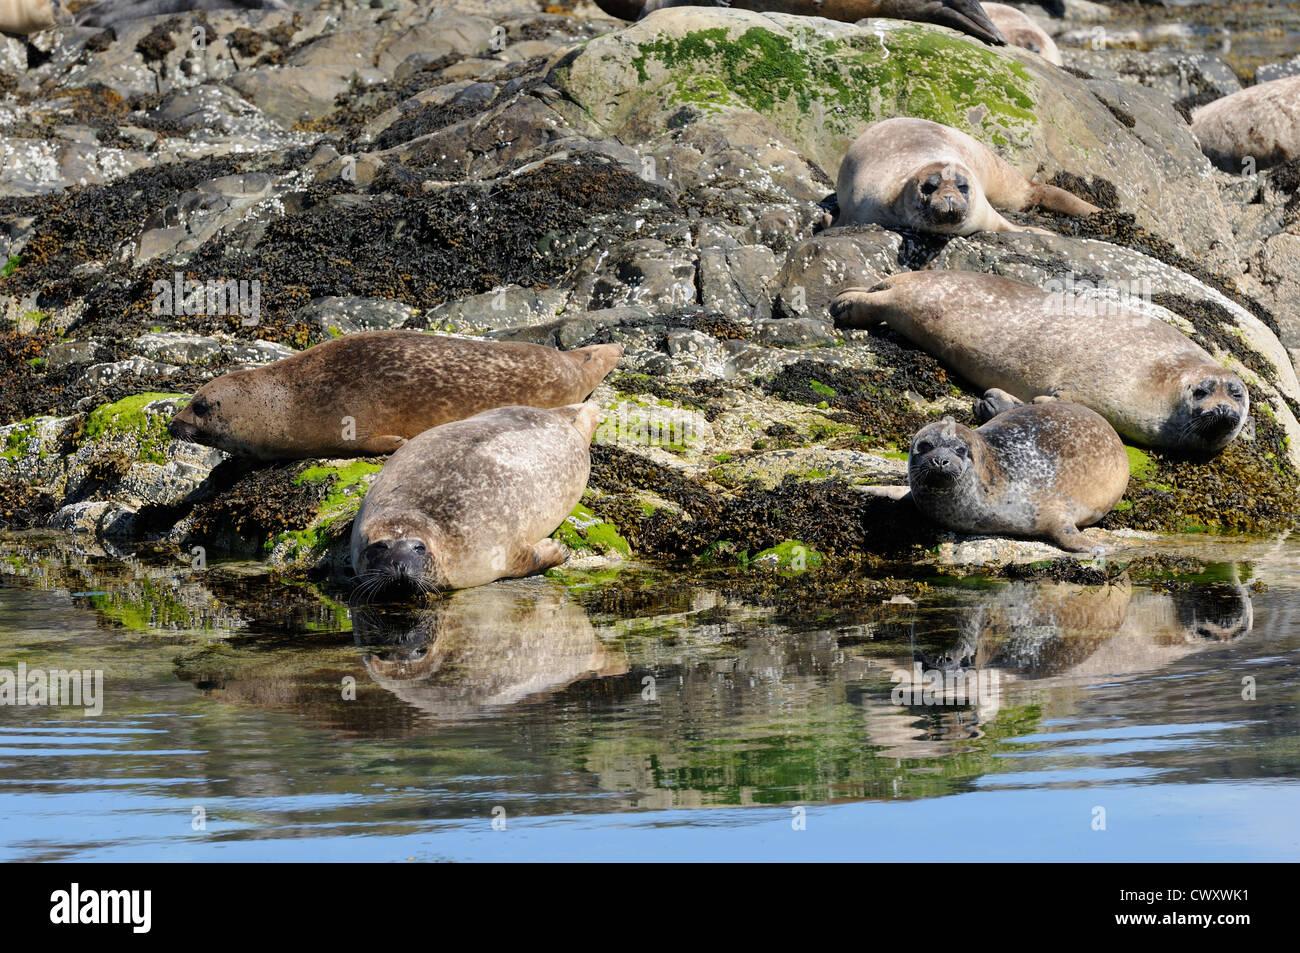 Common seals basking on rocks, Loch Alsh, Scotland Stock Photo